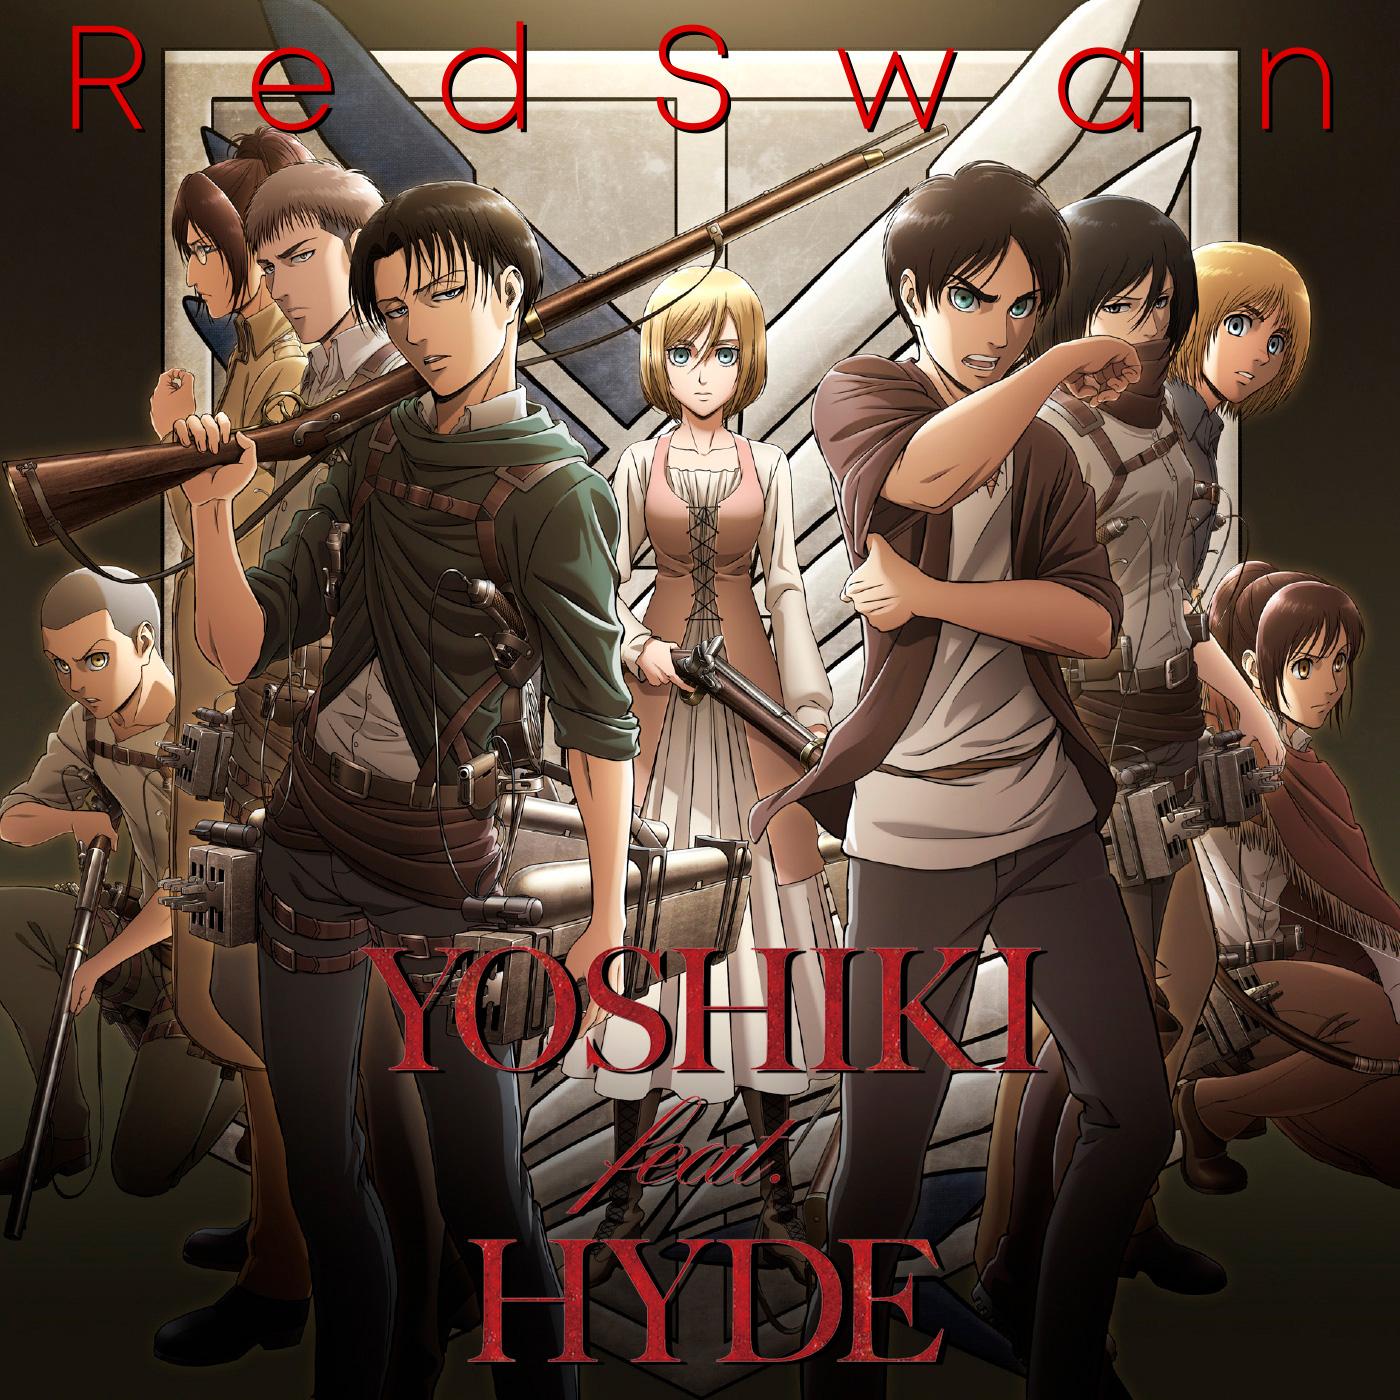 JRock247-Yoshiki-feat-Hyde-Attack-on-Titan-Red-Swan-promo1